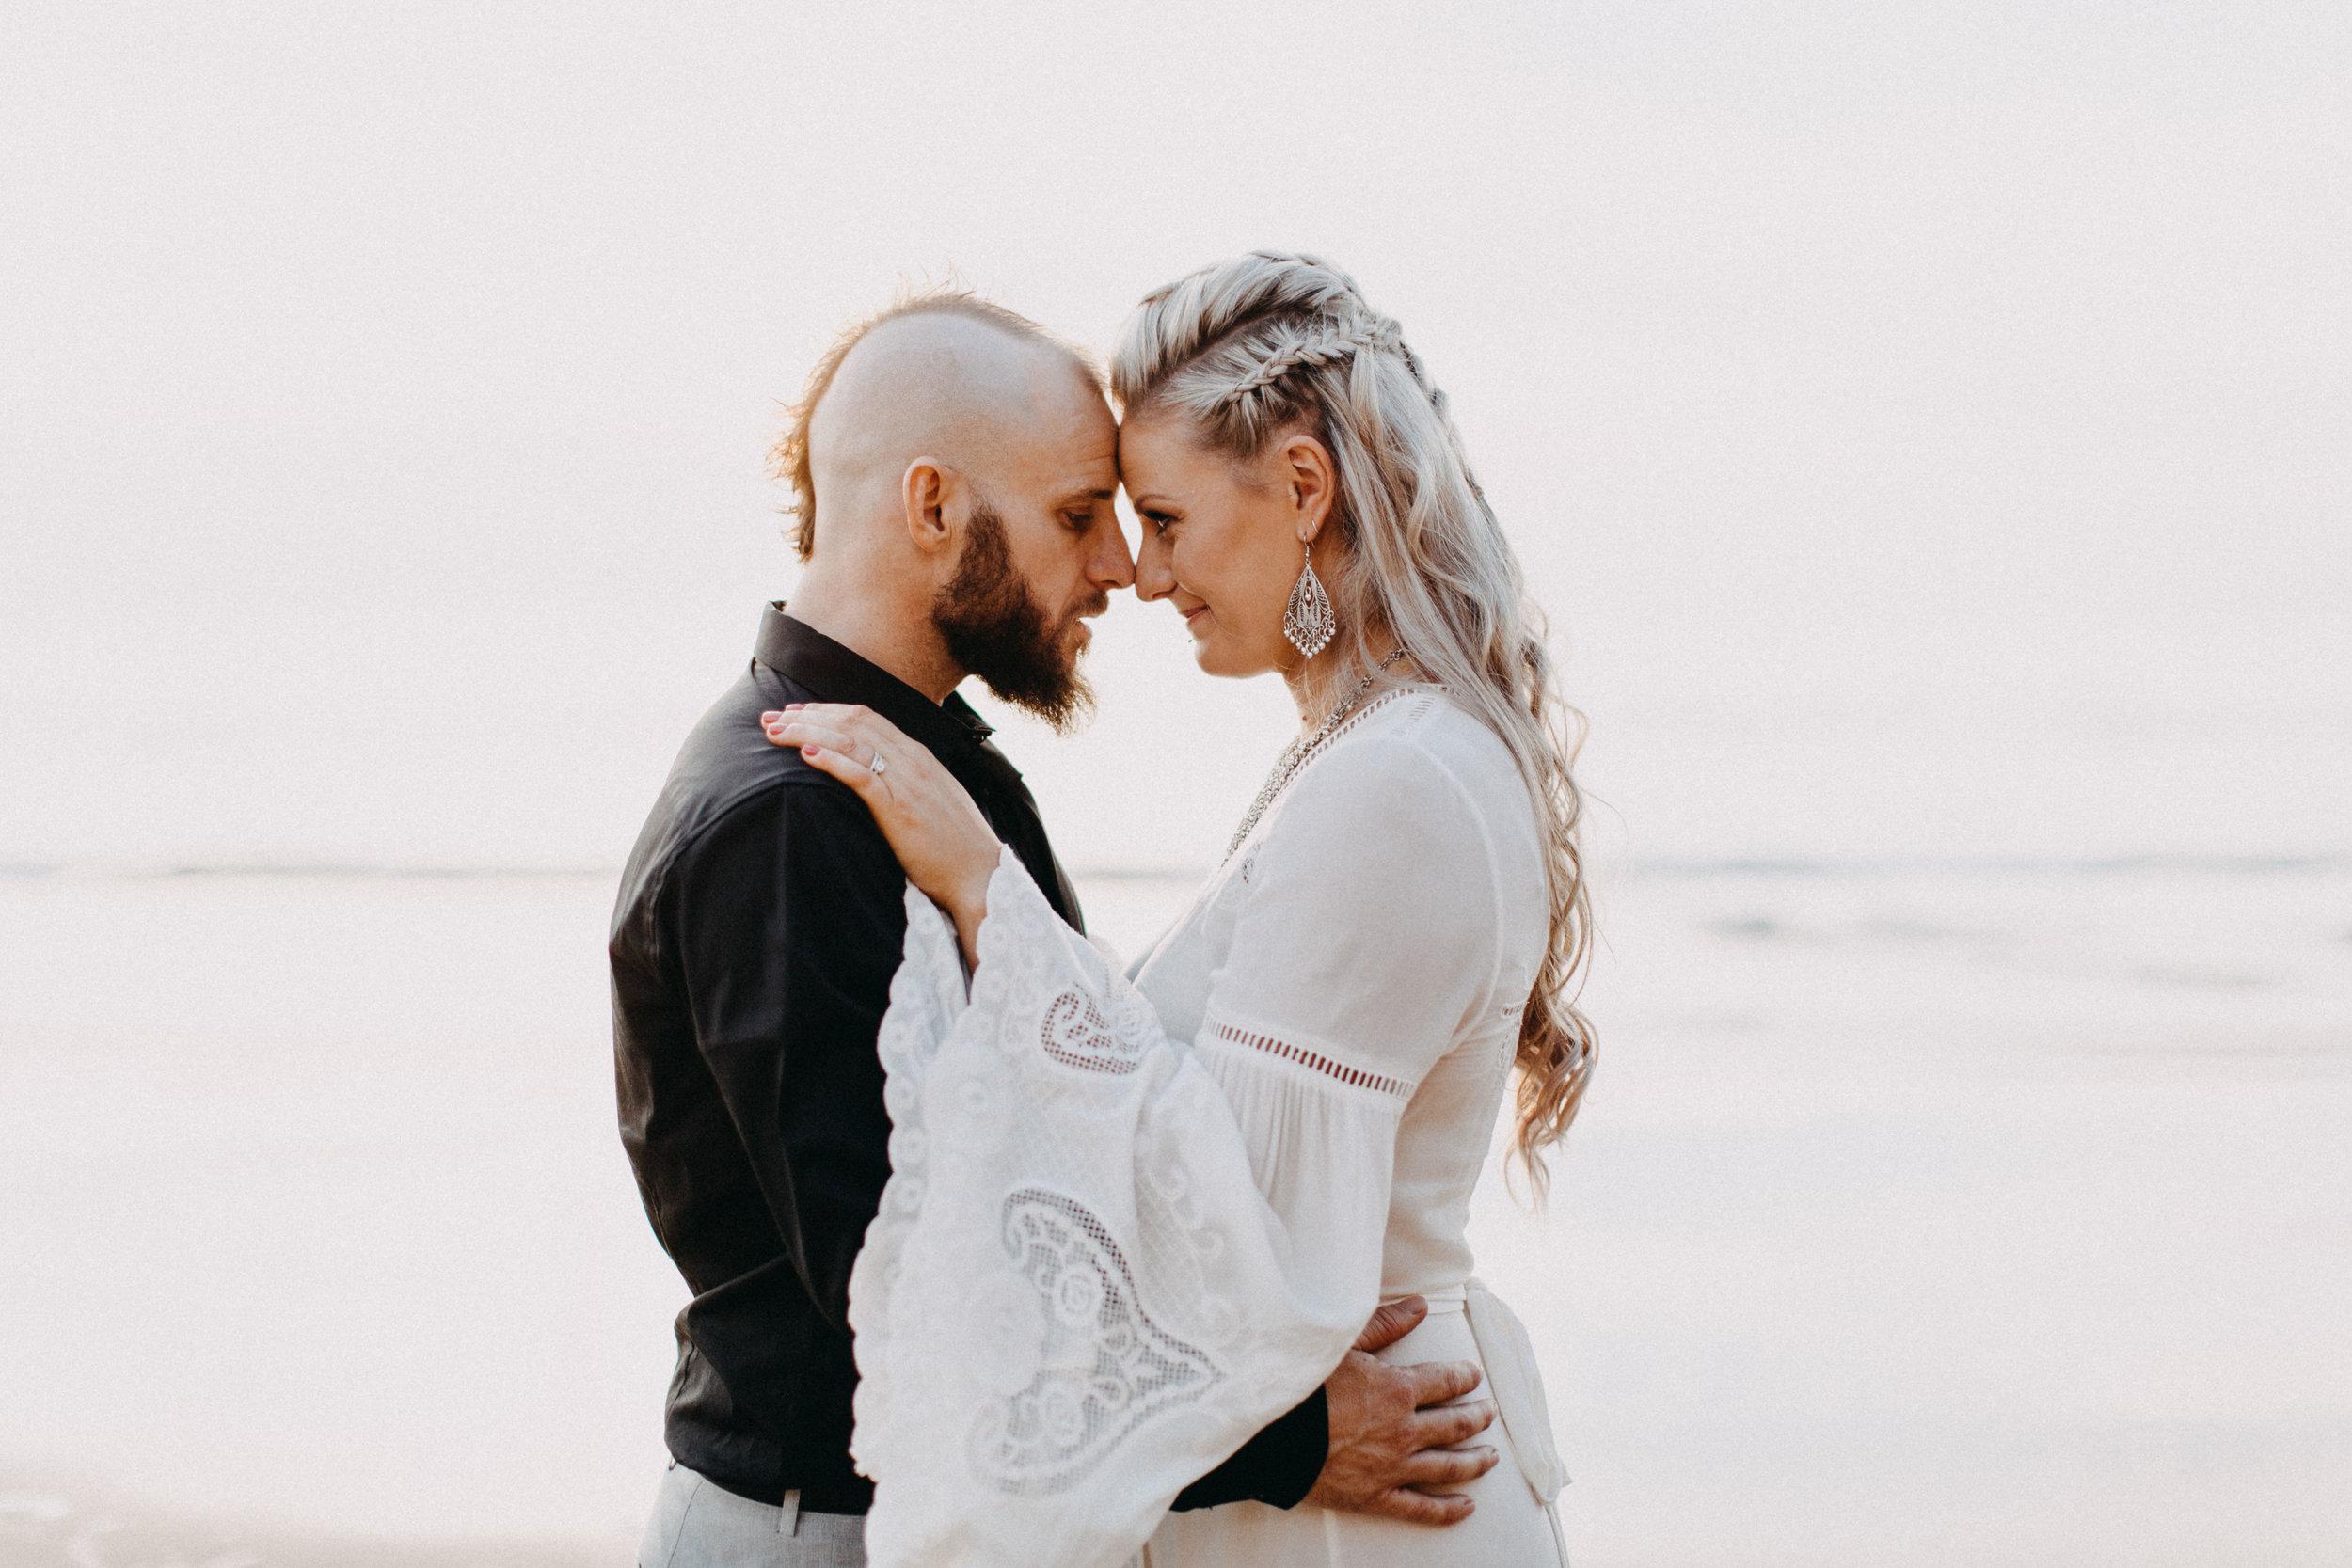 darwin-elopement-wedding-beach-camden-photography-www.emilyobrienphotography.net-86.jpg